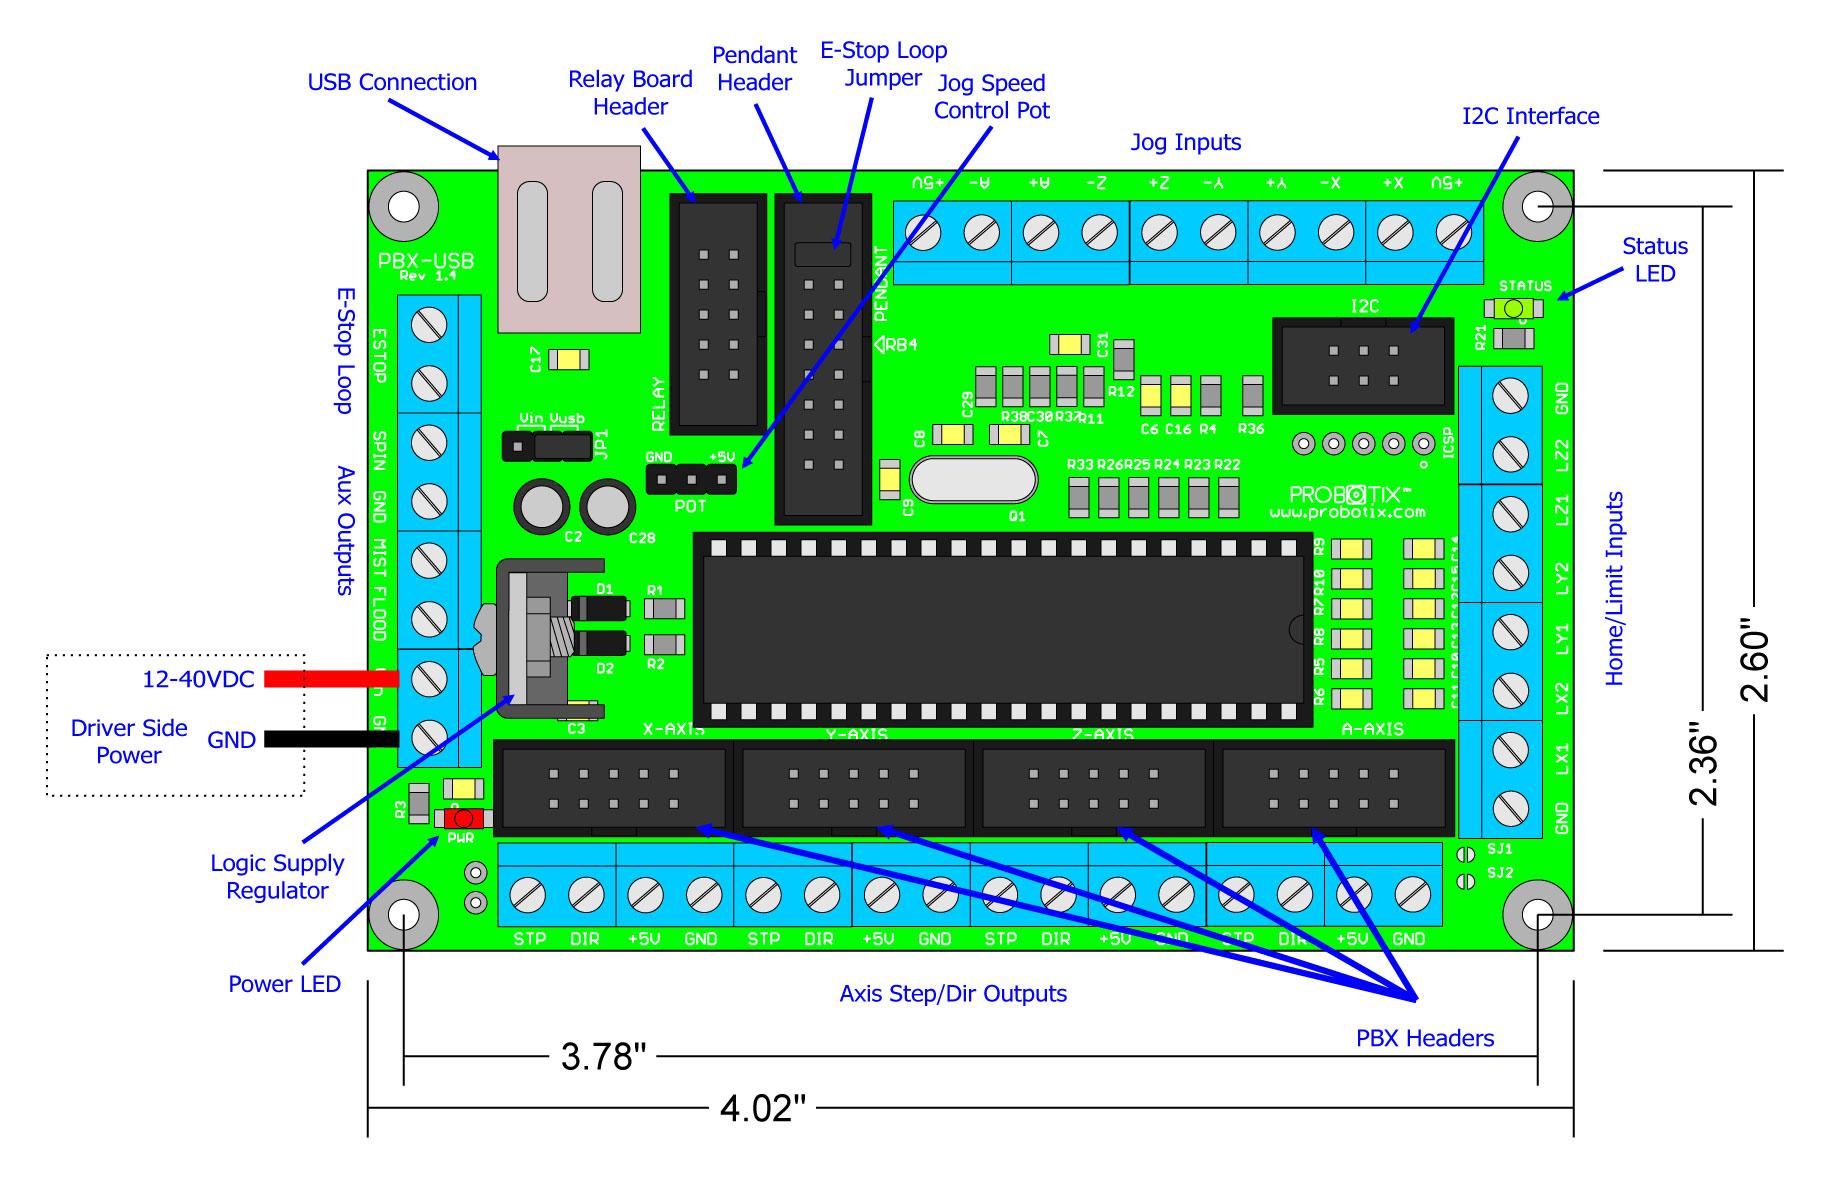 Filepbx Usb Diagram Probotix Wiki September 2013 Circuit